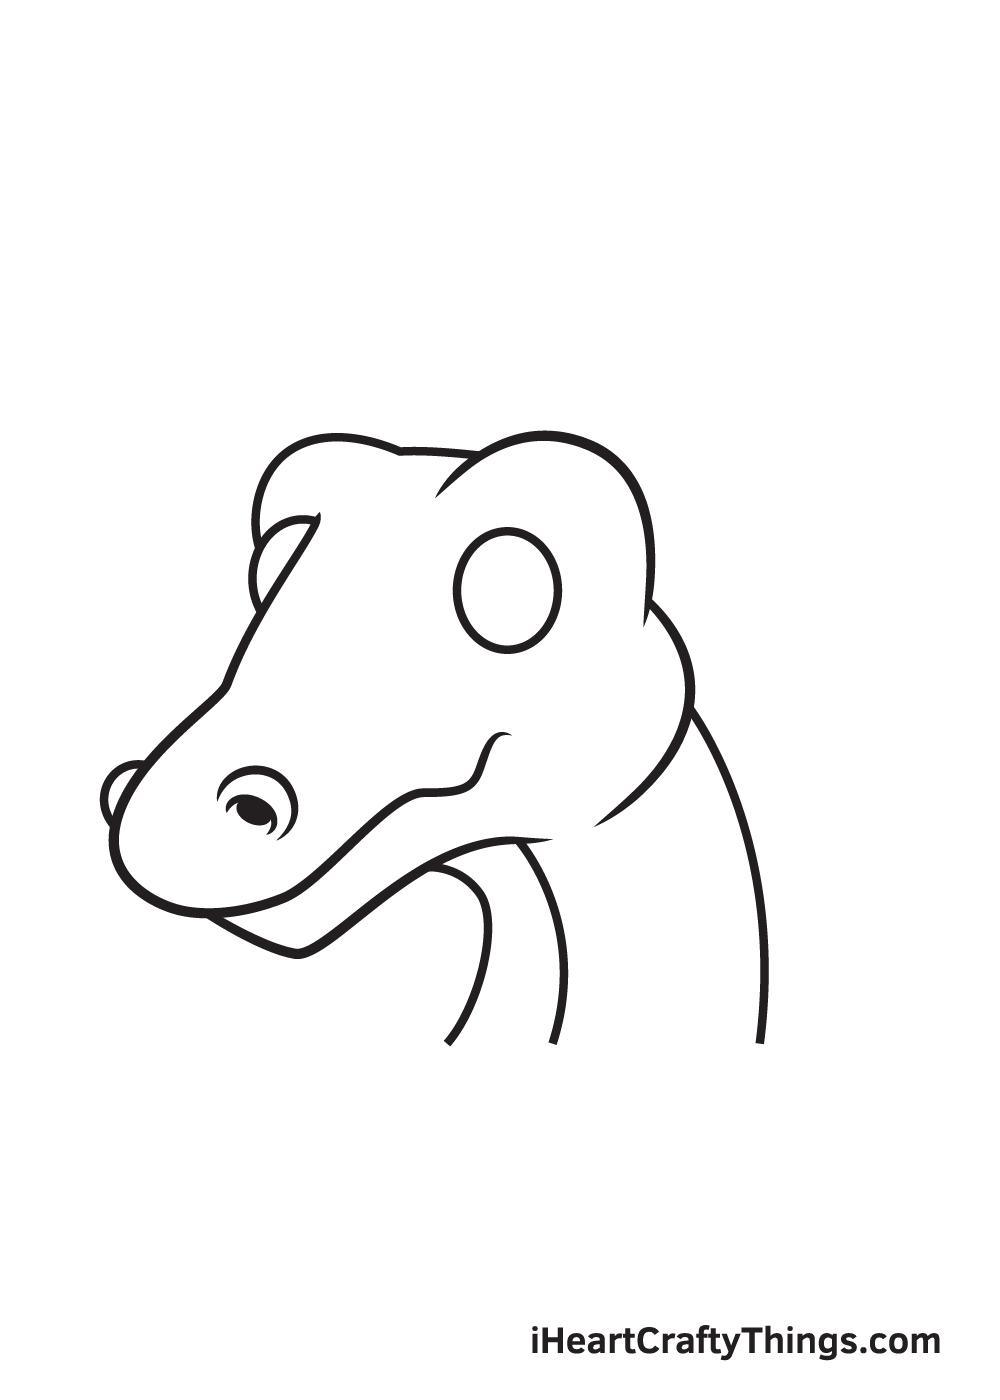 dragon head drawing - step 5